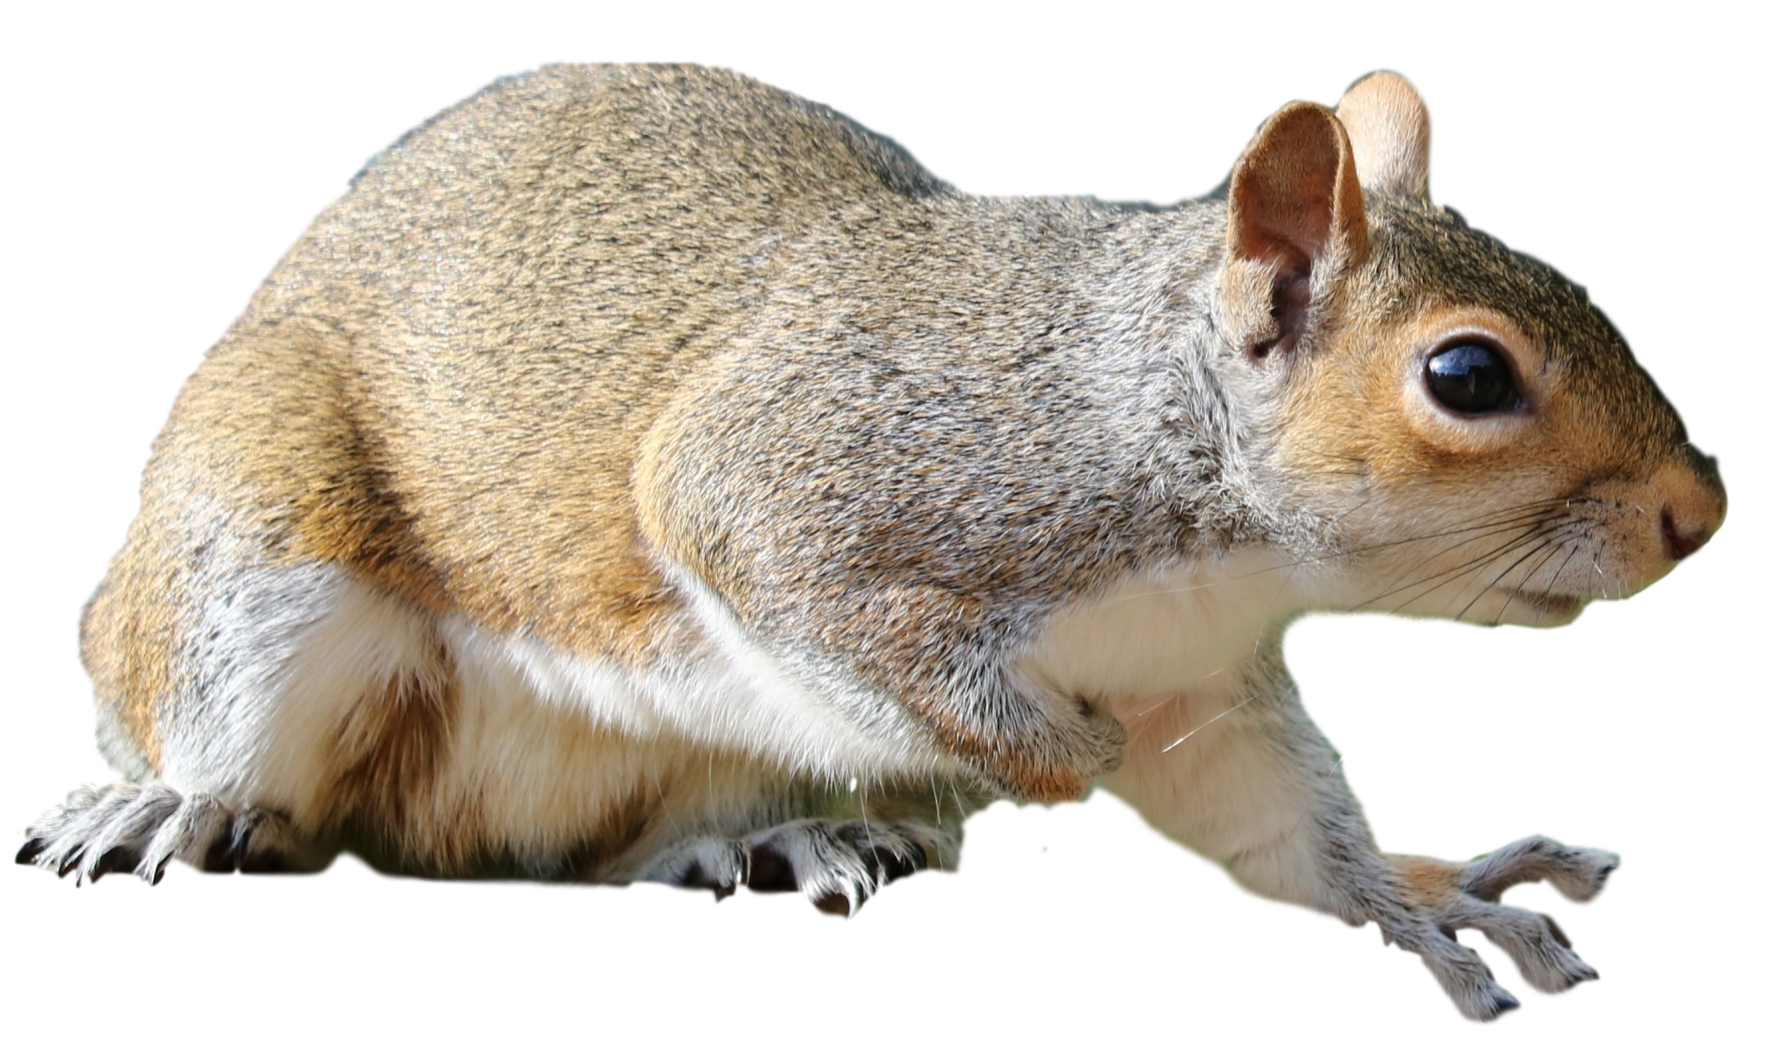 Squirrels in the Attic Scratching (2)